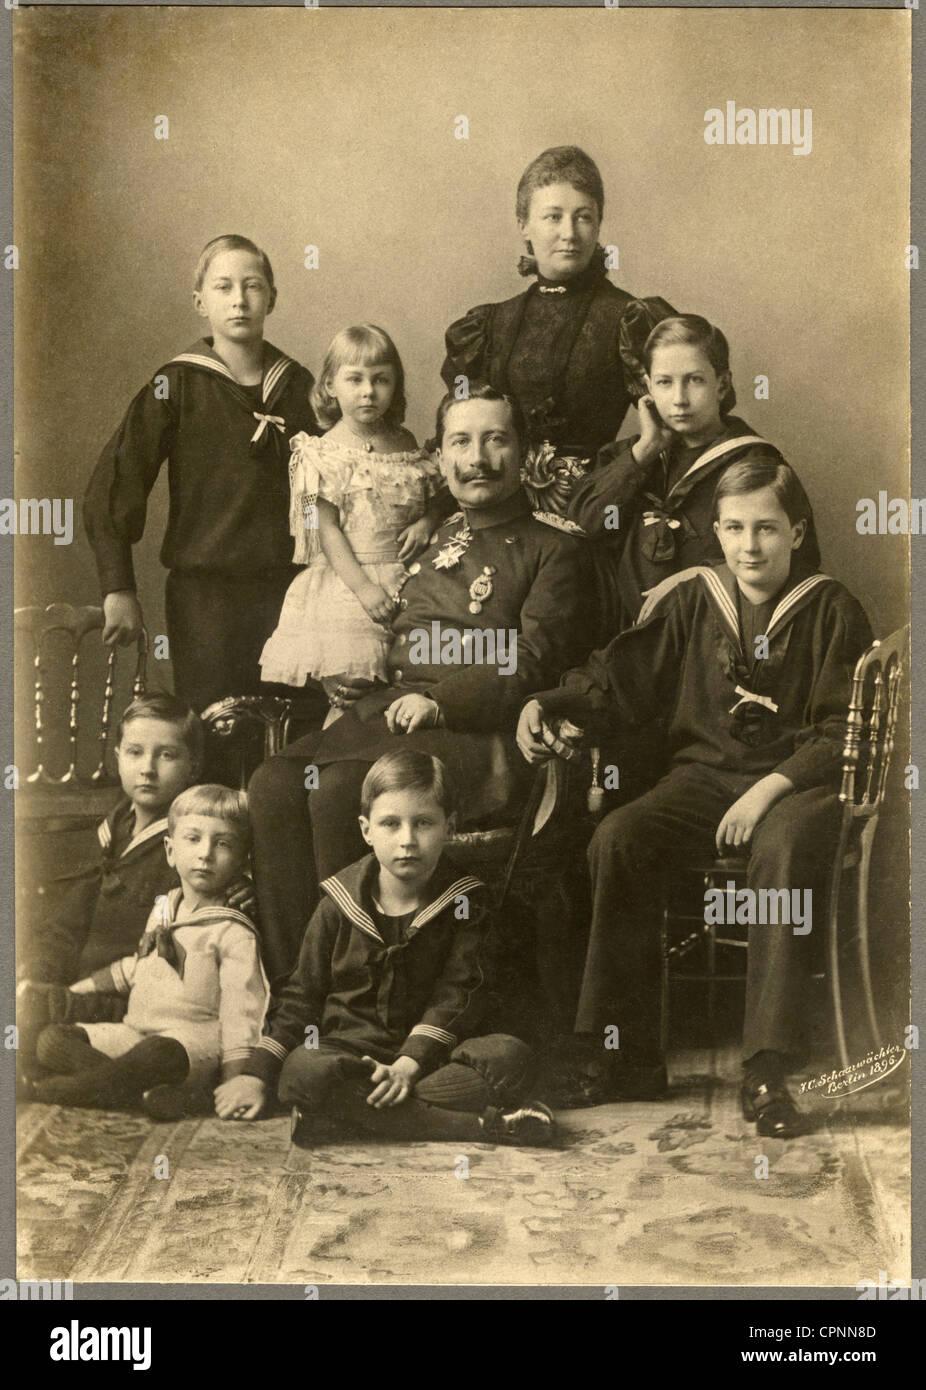 William II, 27.1.1859 - 4.6.1941, empereur allemand 15.6.1888 - 9.11.1918, avec Empress Auguste Victoria (1858 - 1921), avec ses sept enfants : Prince Héritier Frédéric Wilhelm (1882 Bis 1951), Prince Adalbert (1884-1948), Prince Joachim (1890 Bis 1920), Princesse Viktoria-Luise (1892 Bis 1980), Prince August Wilhelm (1887-1949), Prince Eitel Friedrich (1883-1942), Prince Oskar (1888 Bis 1958), Berlin, Allemagne, 1896, Banque D'Images